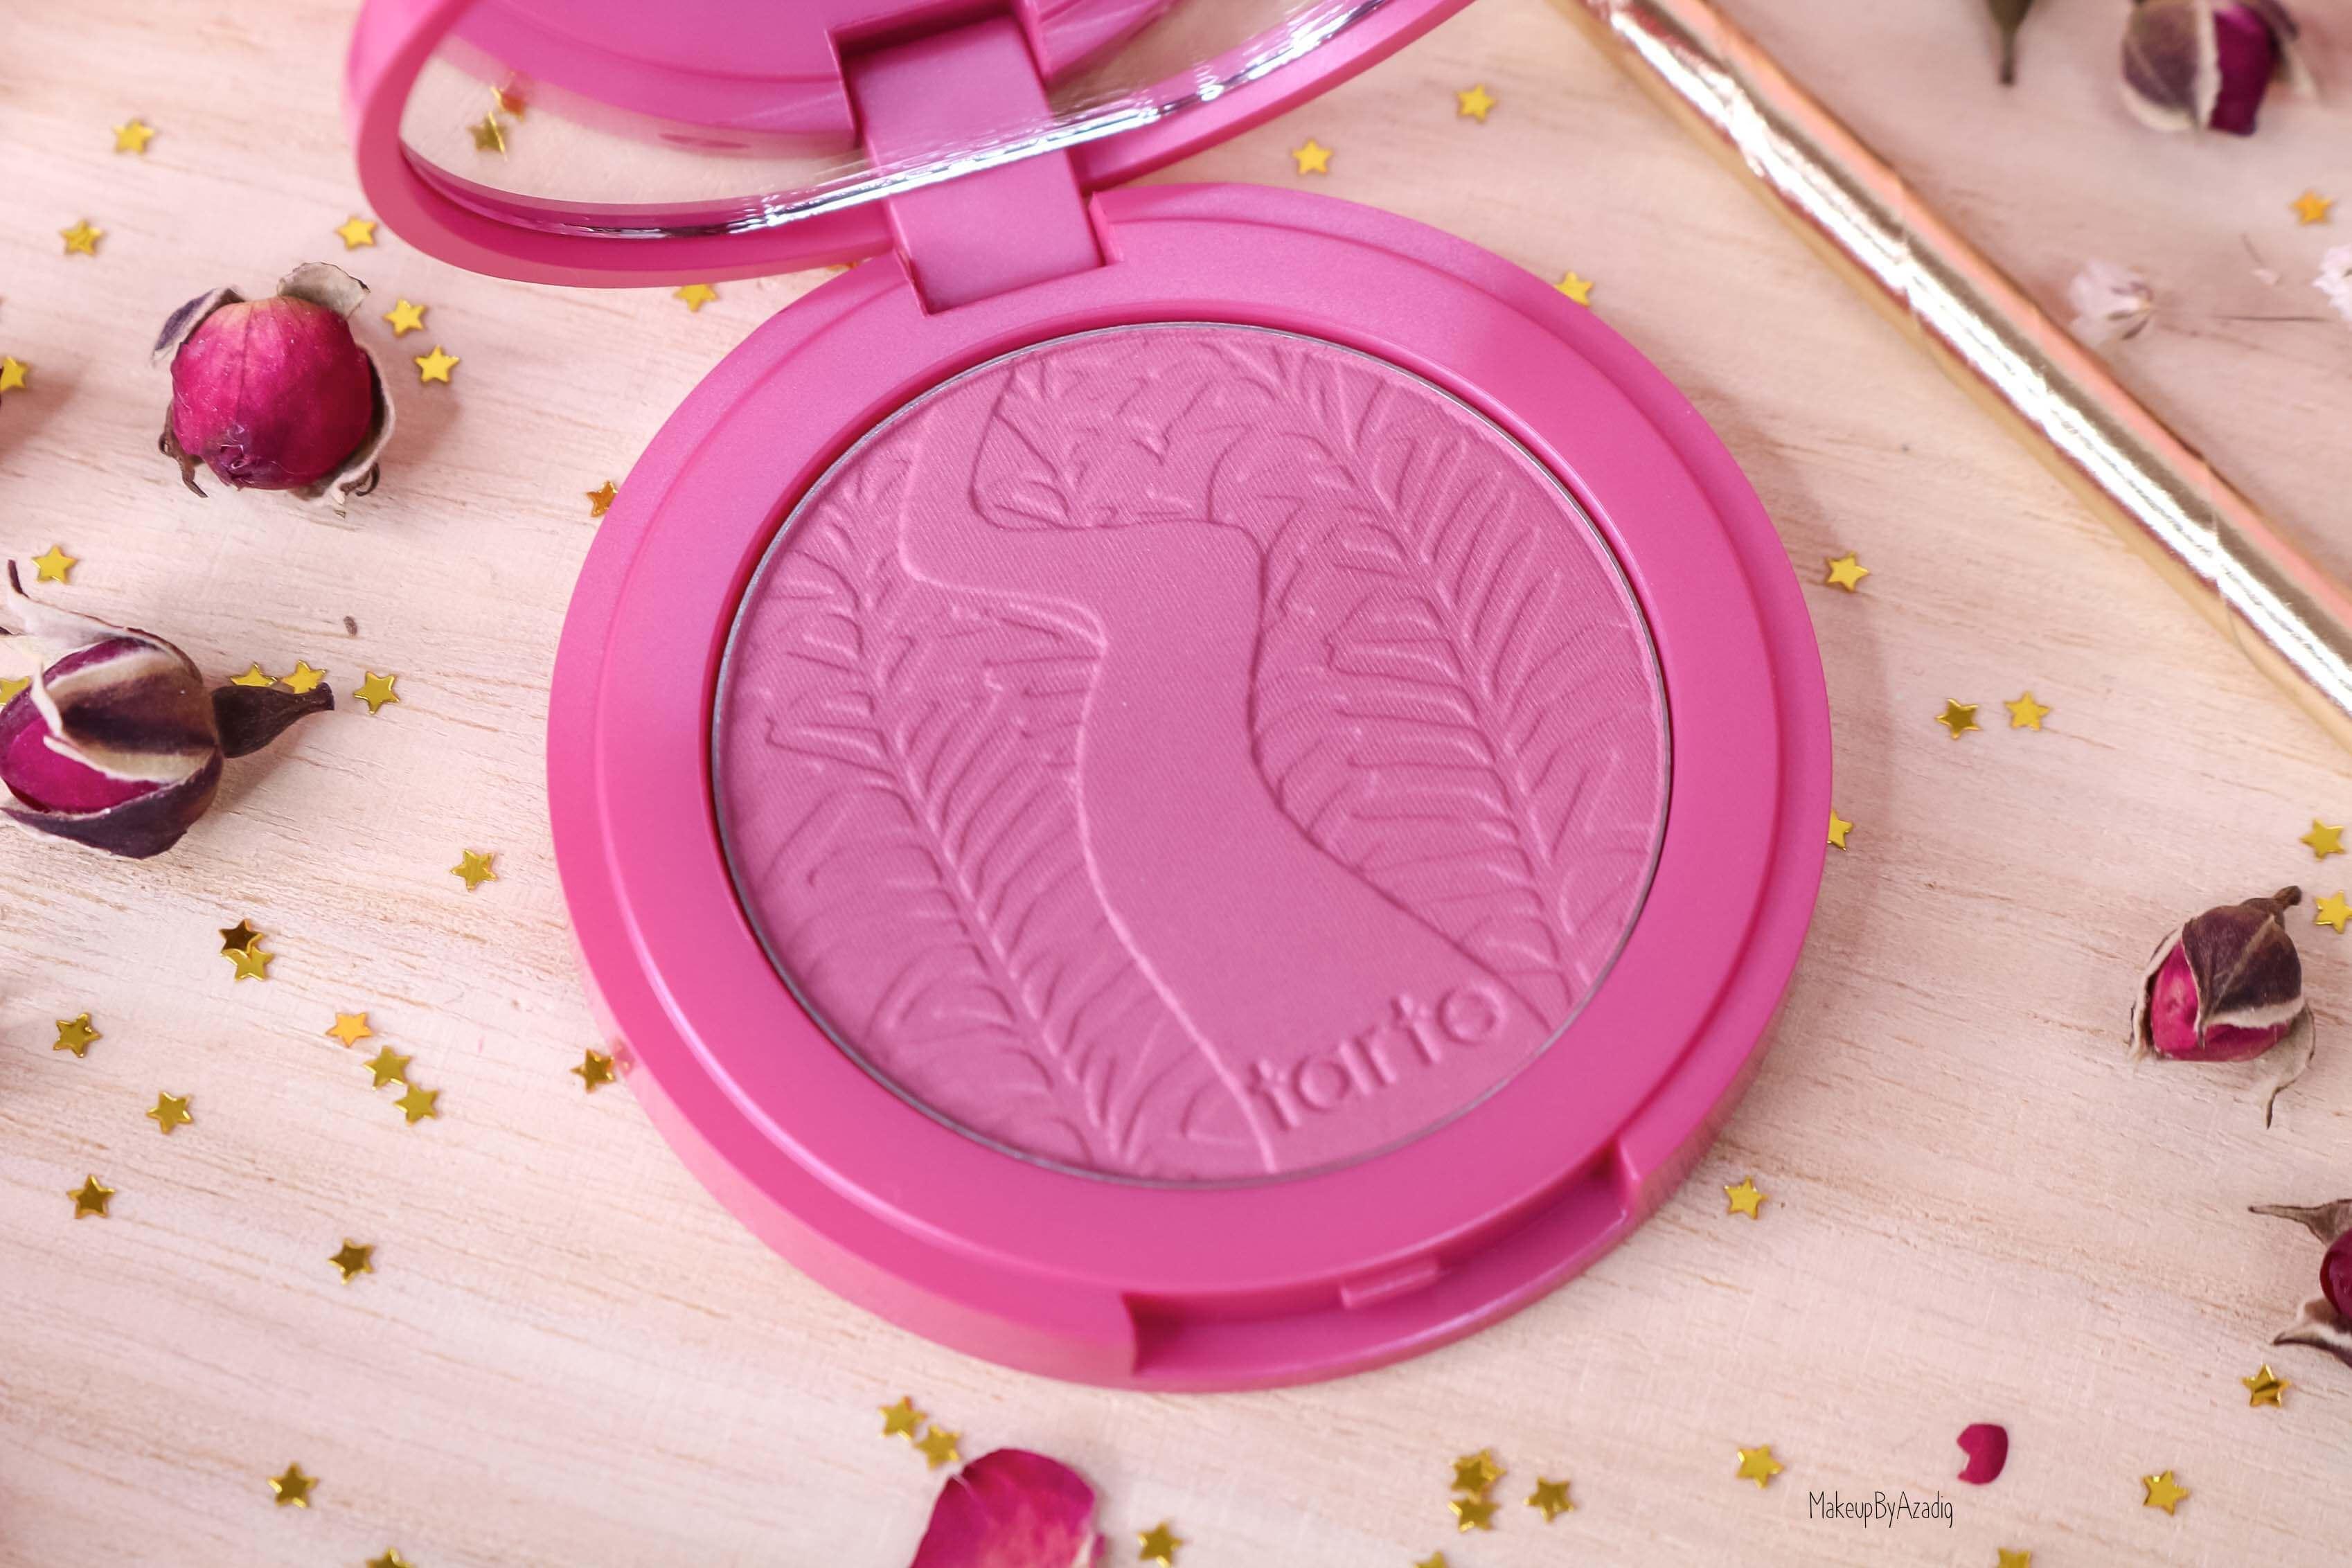 revue-blush-amazonian-clay-tarte-cosmetics-makeupbyazadig-sephora-france-blushing-bride-swatch-avis-prix-poudre